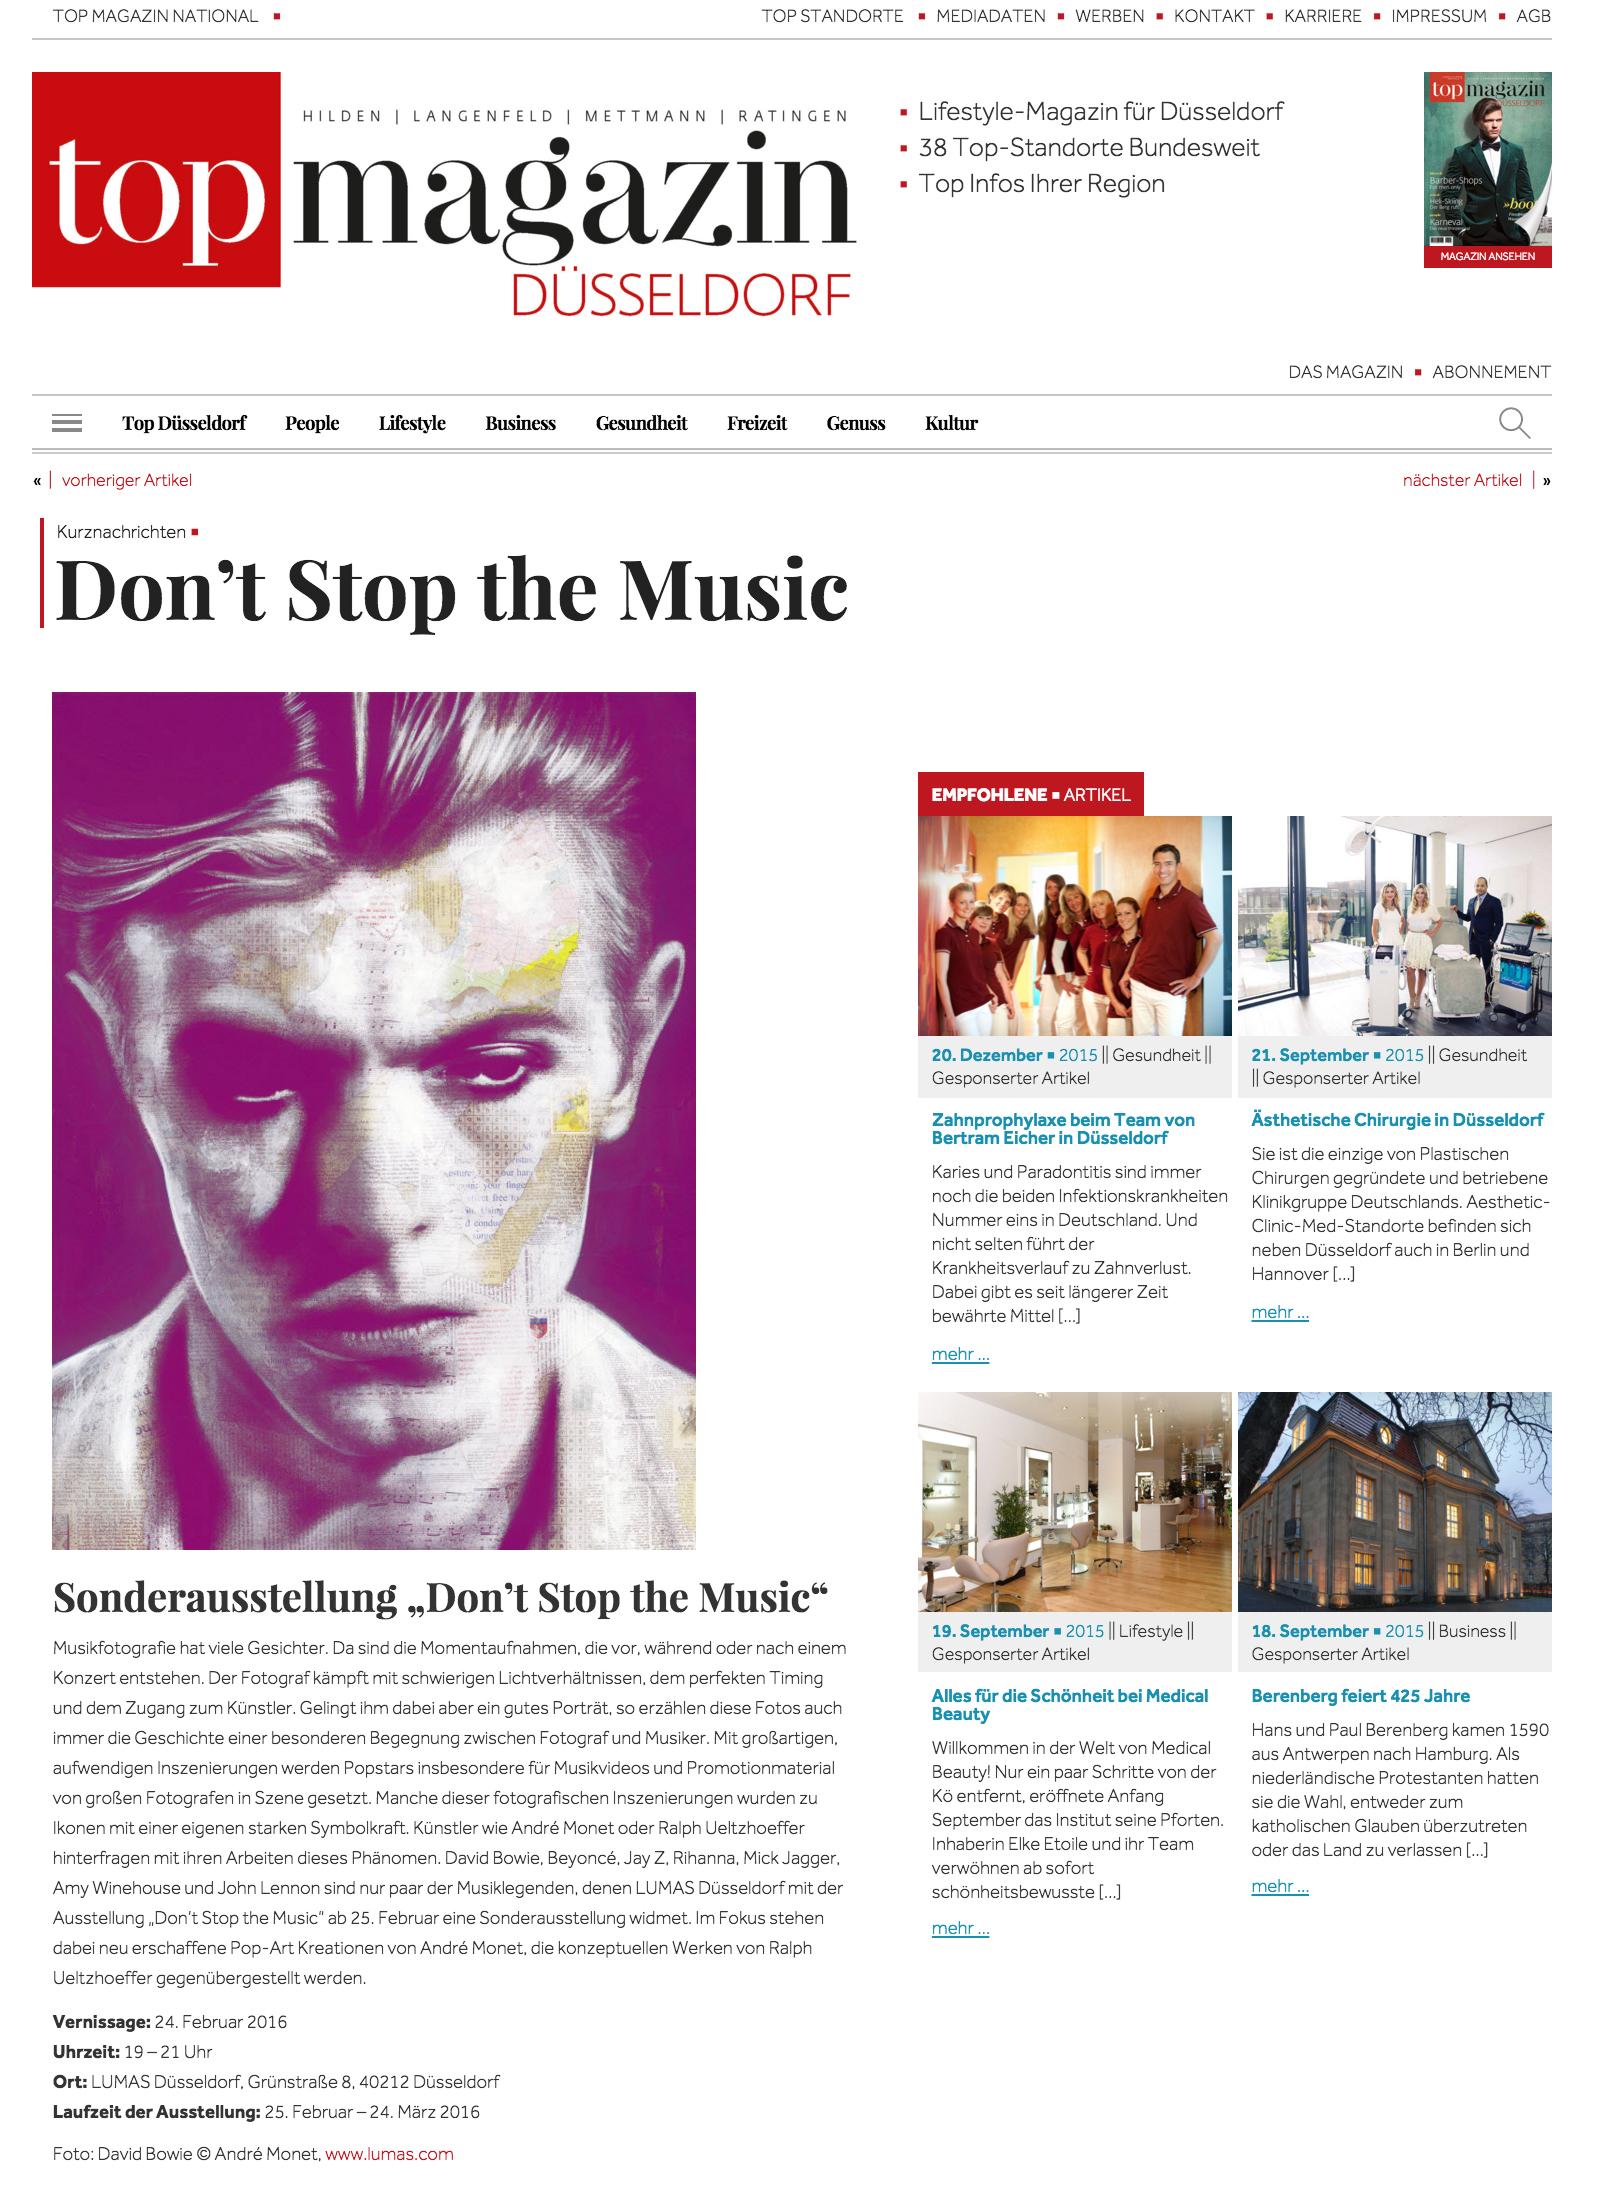 top_magazin_Düsseldorf_dussel